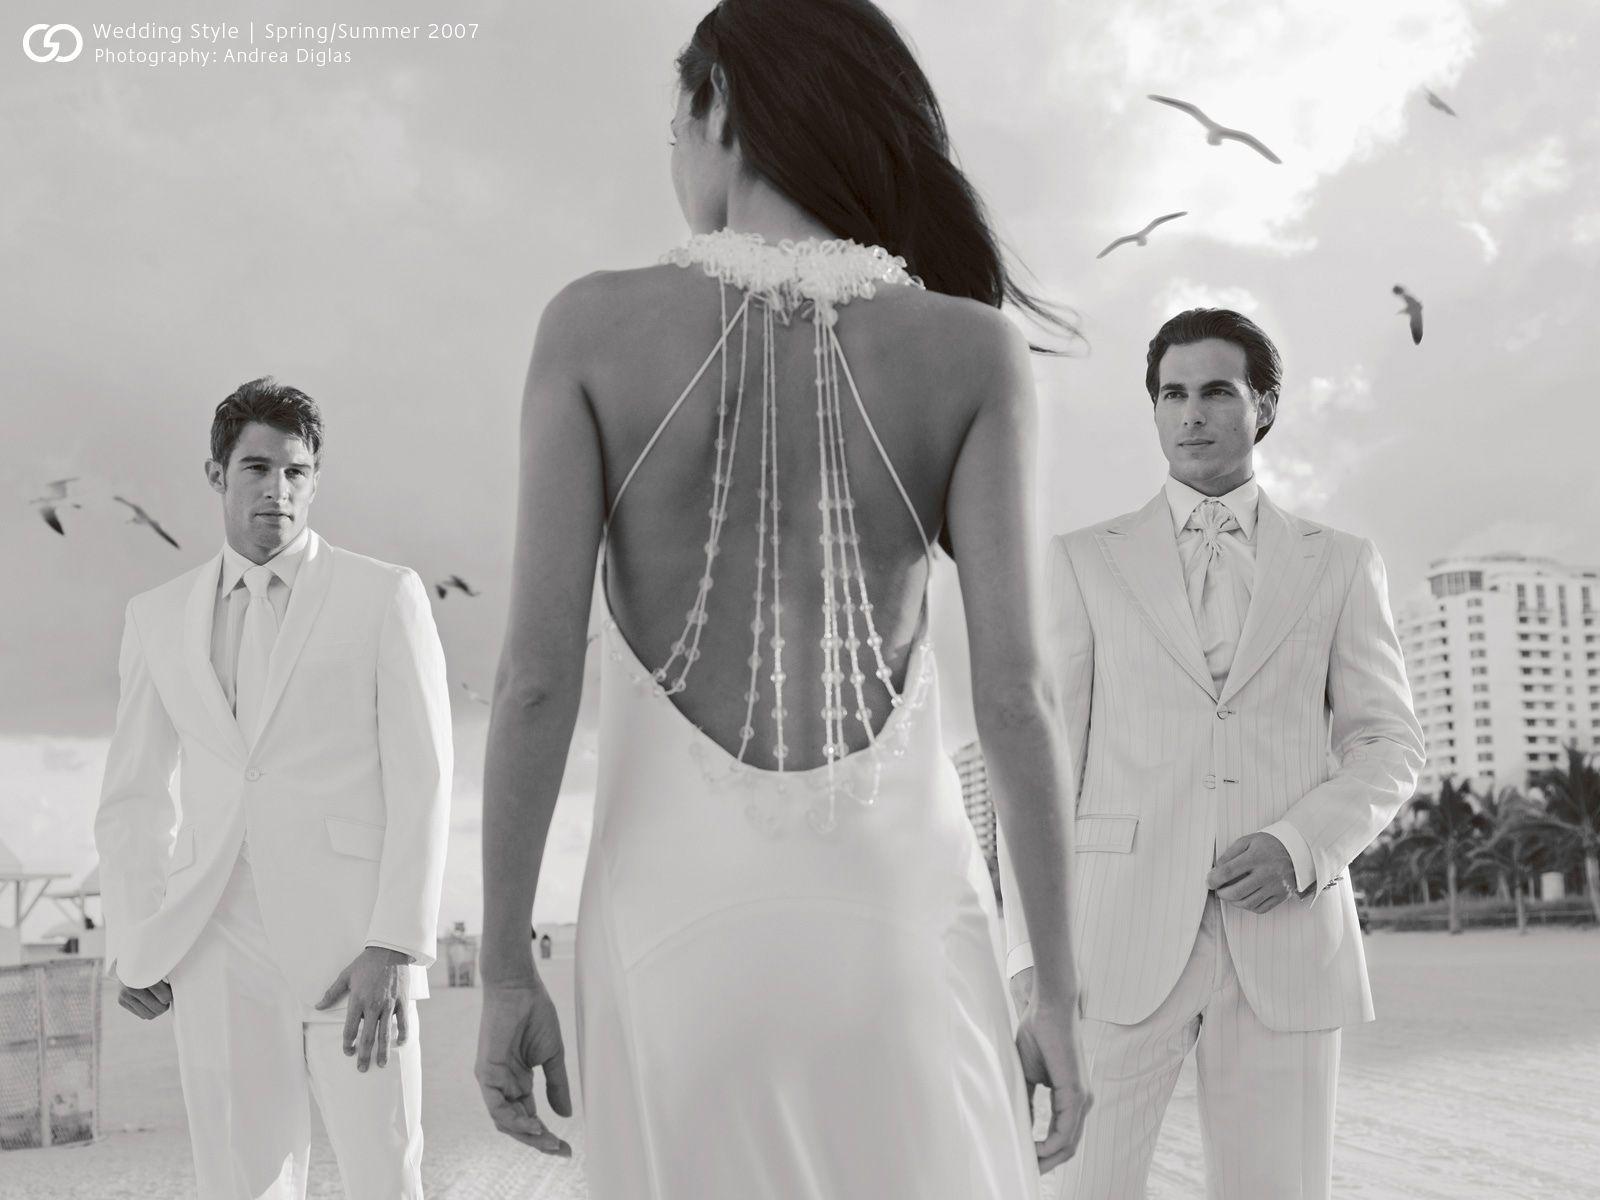 grace+ormonde+wedding+style/spring+summer | Wedding Style Magazine Spring Summer 2007 Fashion Shoot